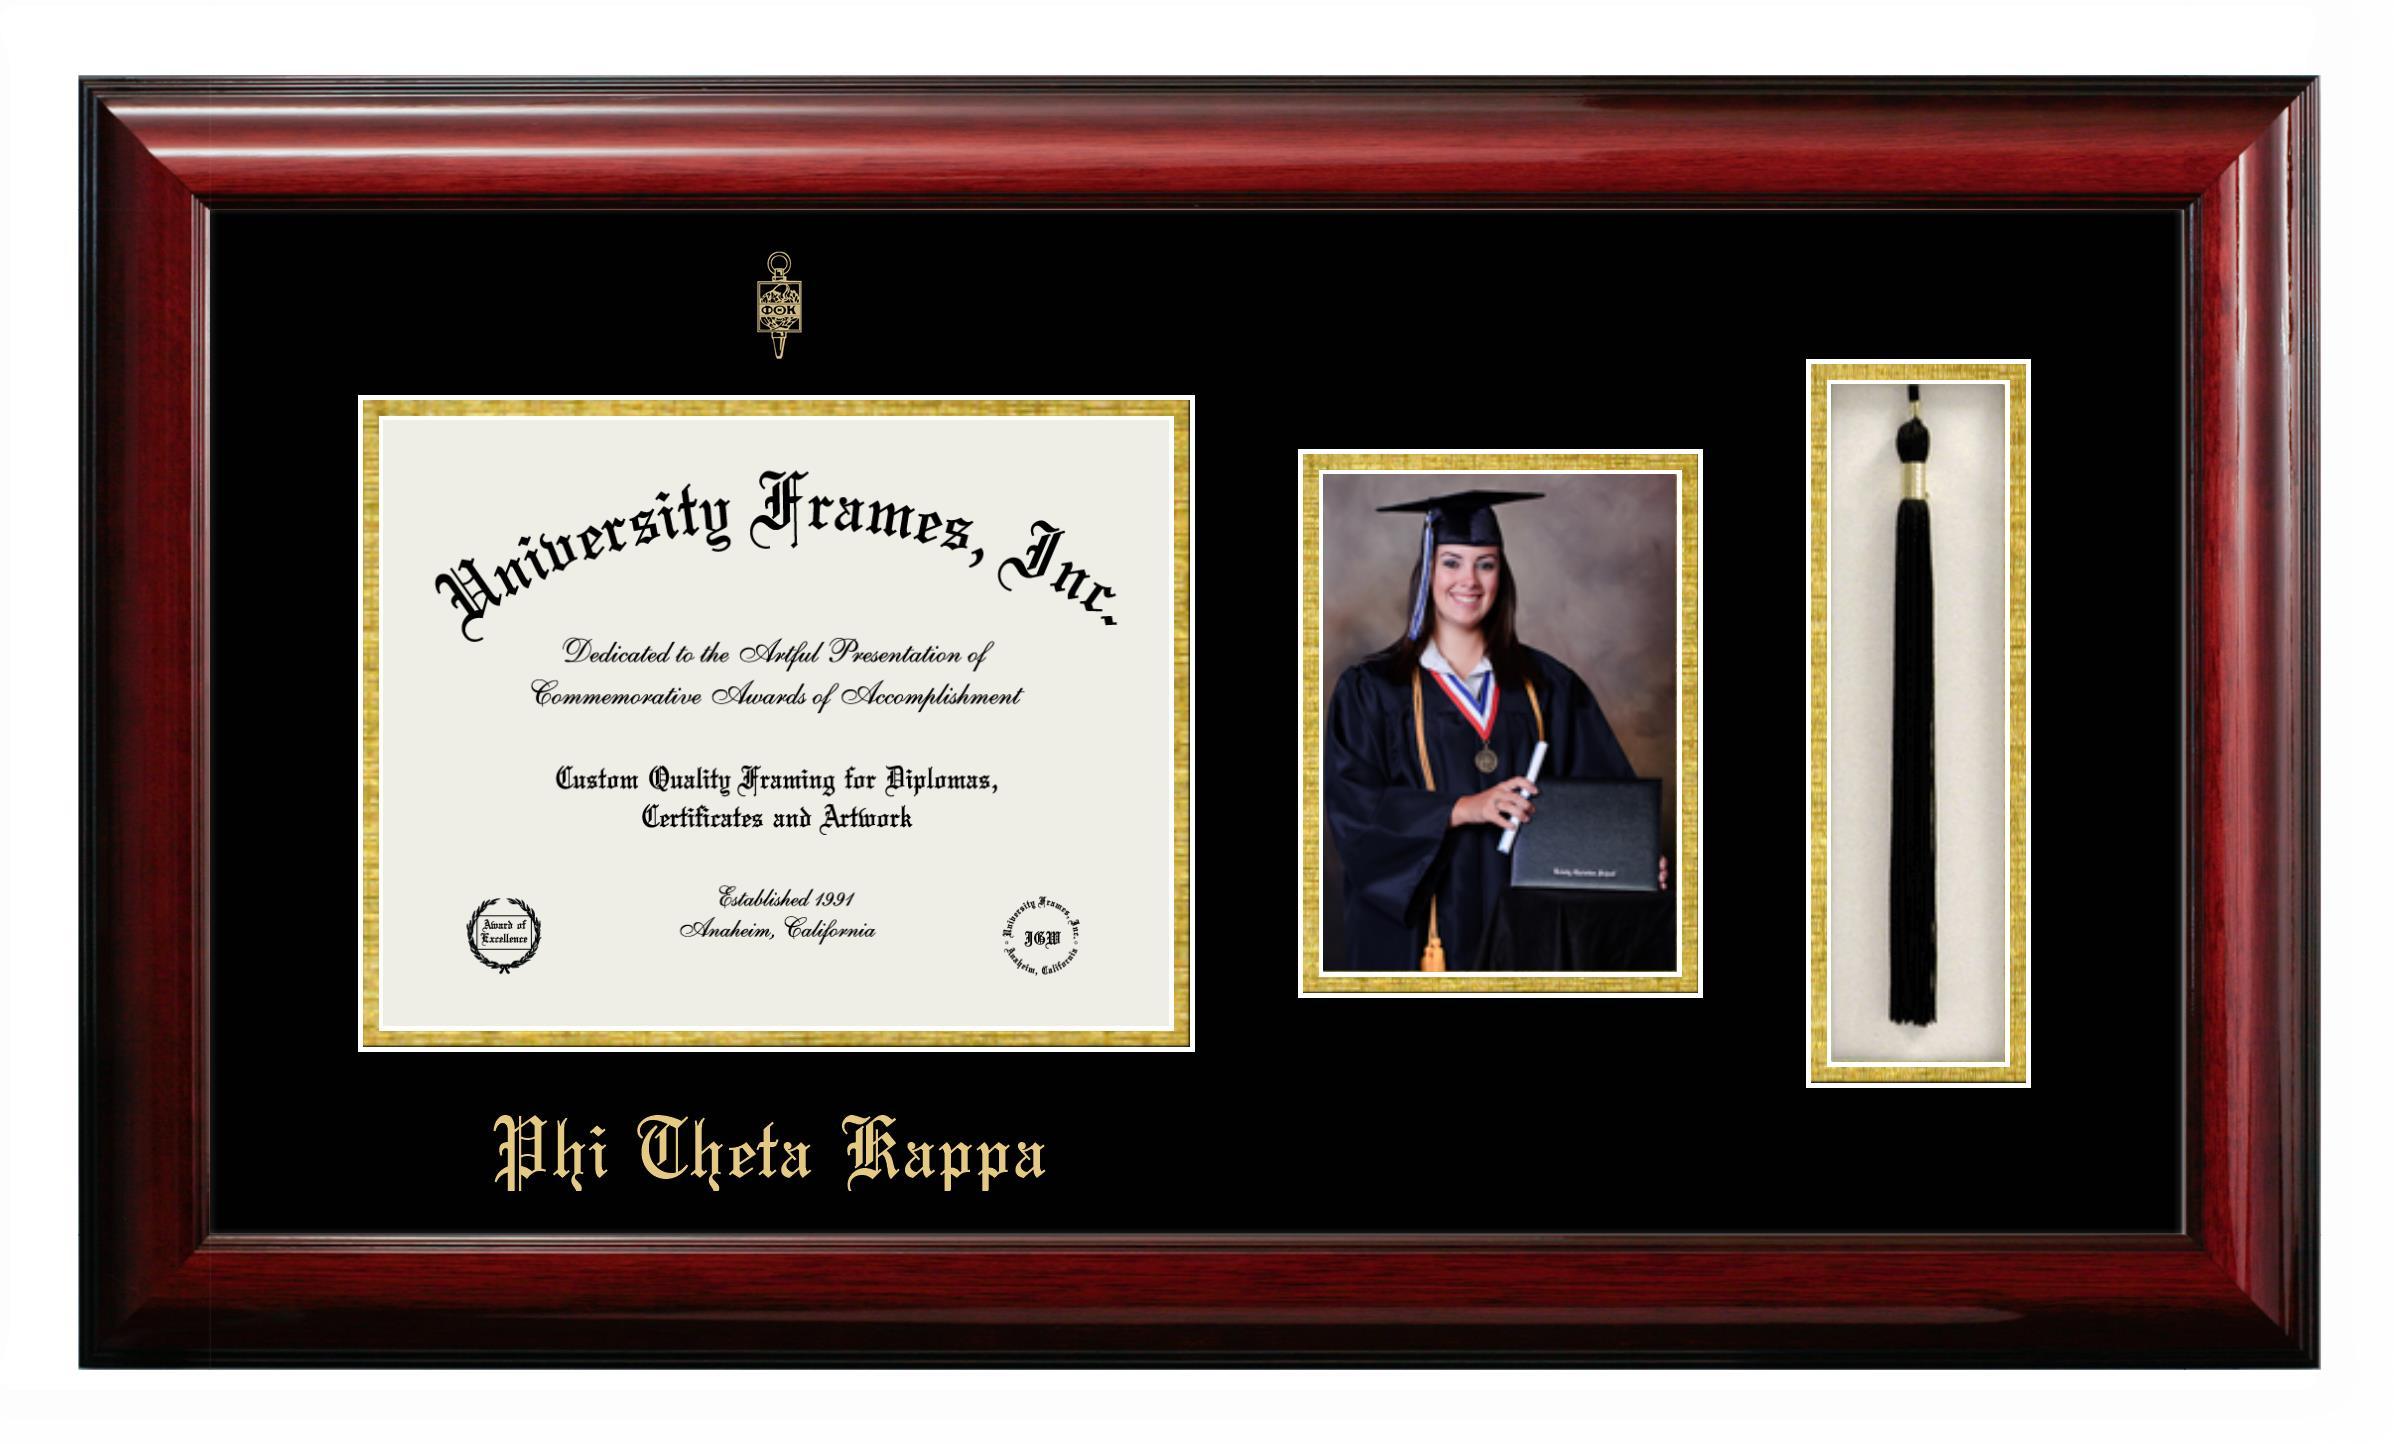 Phi Theta Kappa Diploma With 5 X 7 Portrait Tassel Box Frame In Classic Mahogany With Black Gold Mats